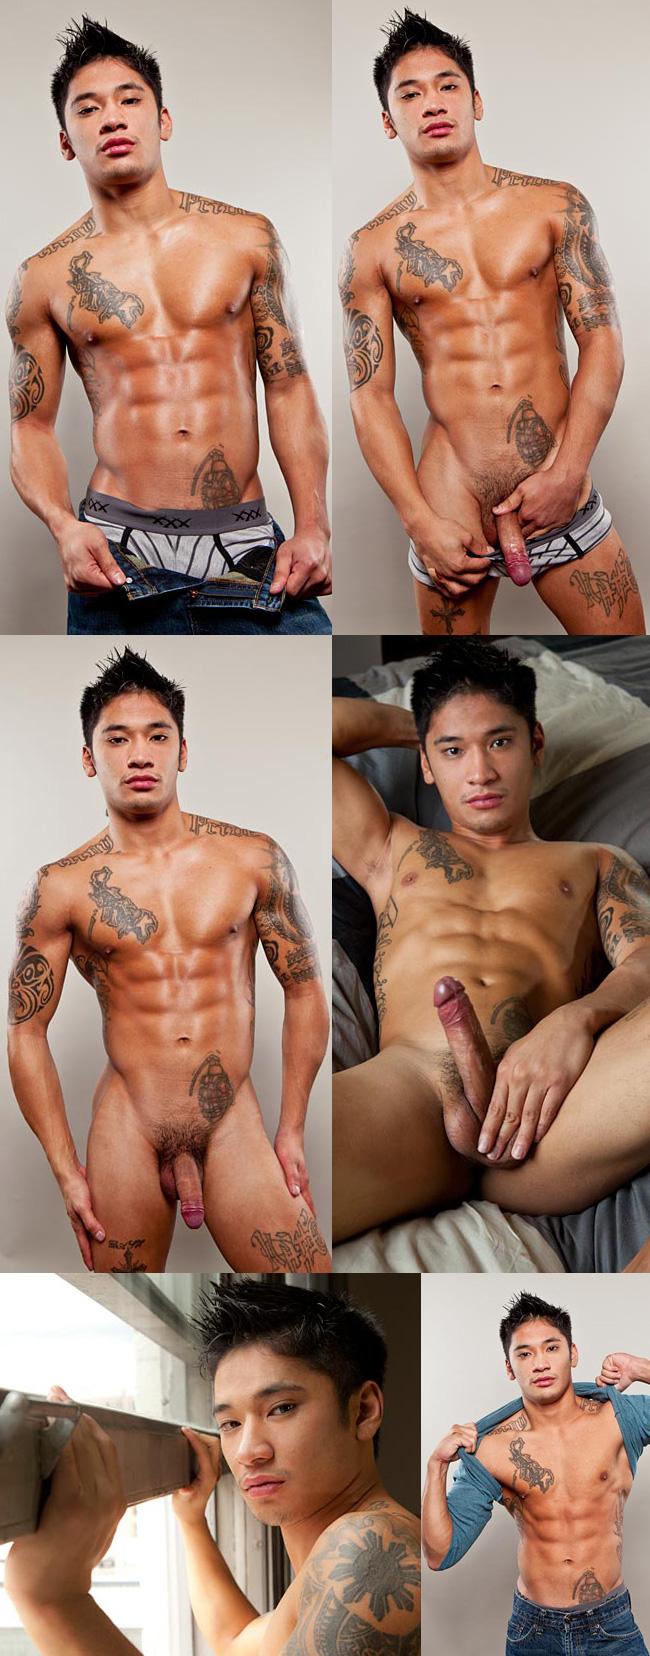 Asian Porn Gay Videos gay asian boys porn blog – page 9 – get your gay asian porn